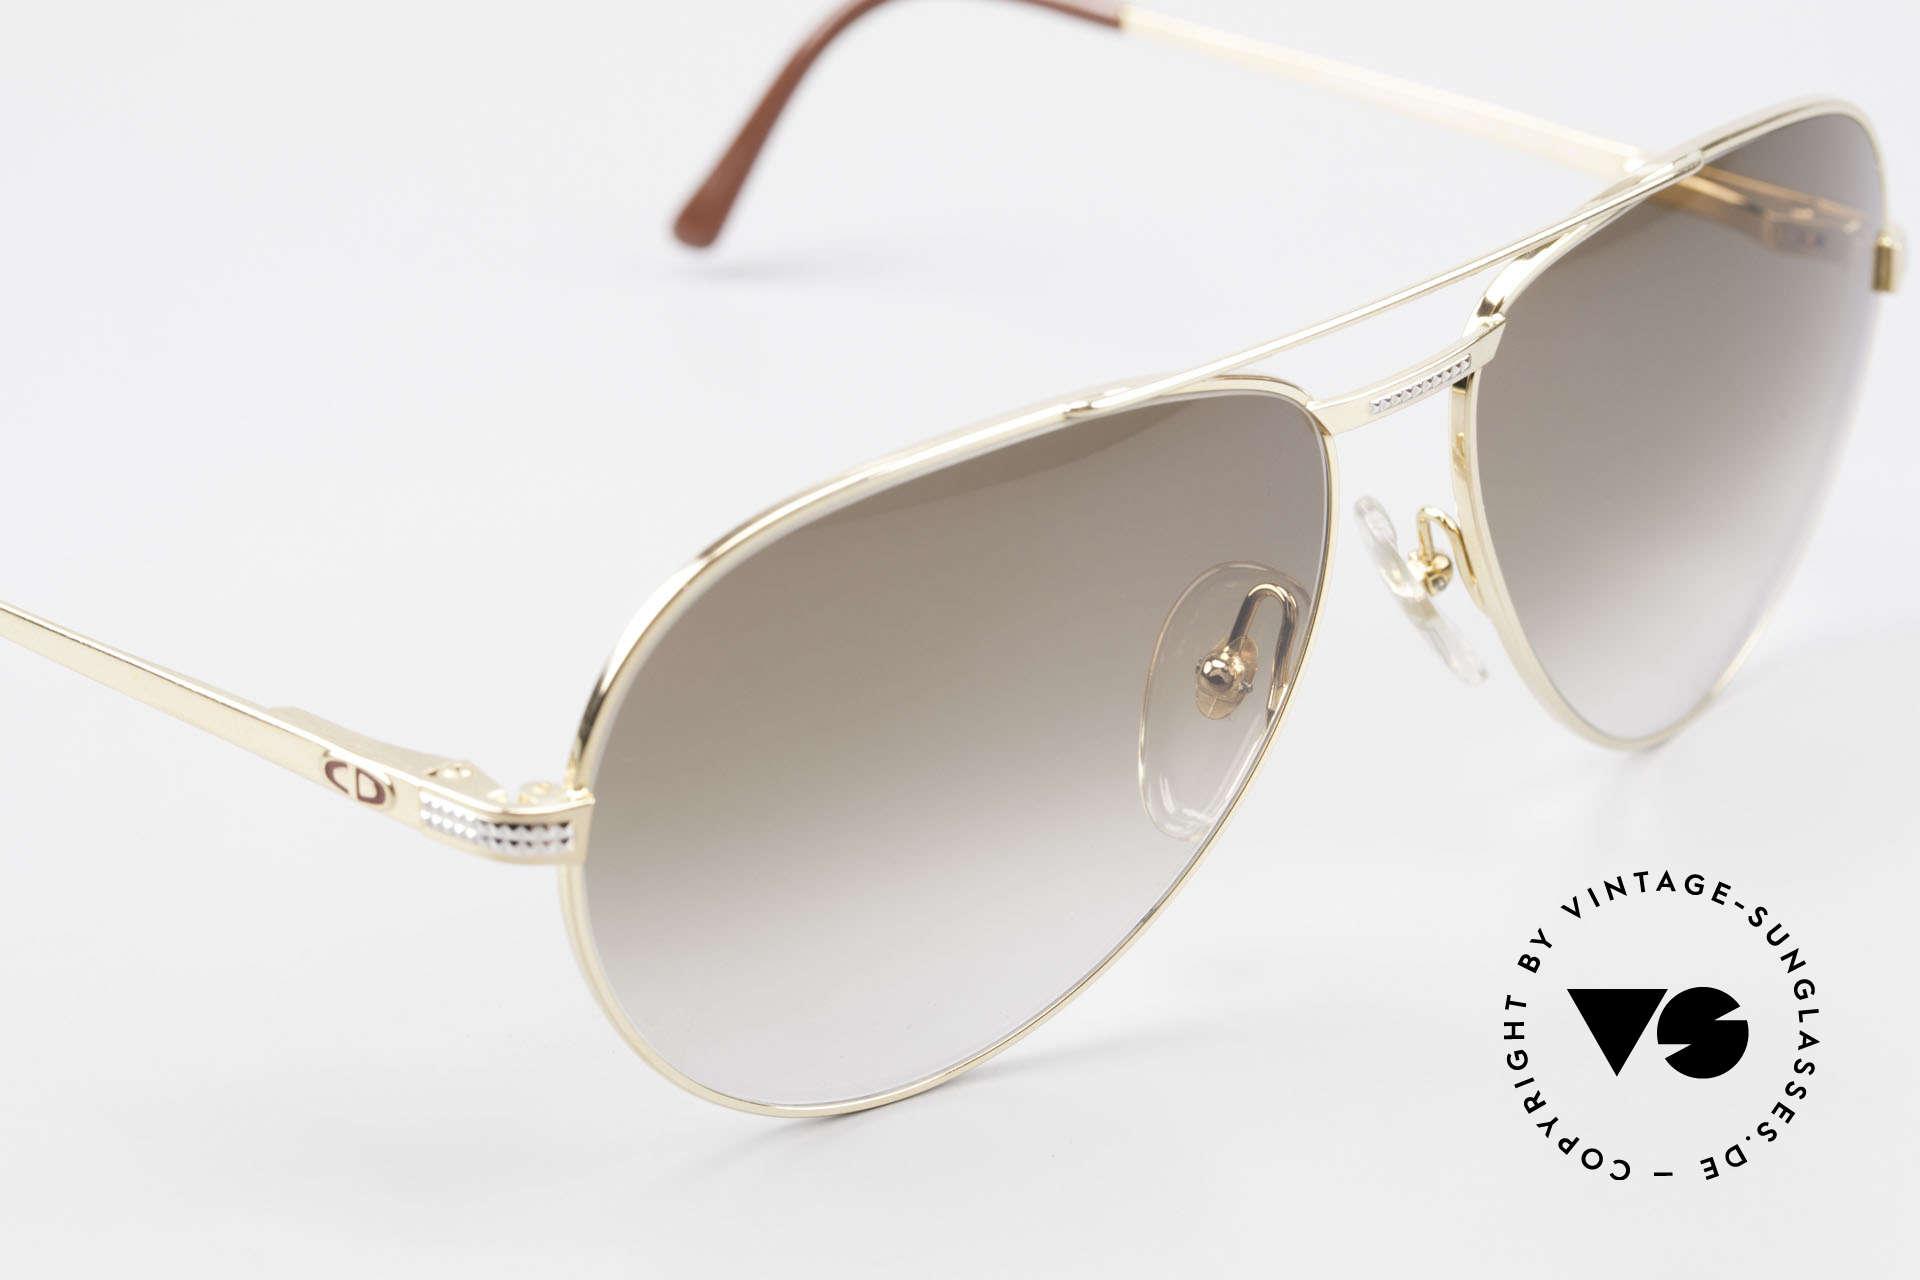 Christian Dior 2780 Gold-Plated 90's Aviator Frame, NO RETRO design, but a 25 years old ORIGINAL, Made for Men